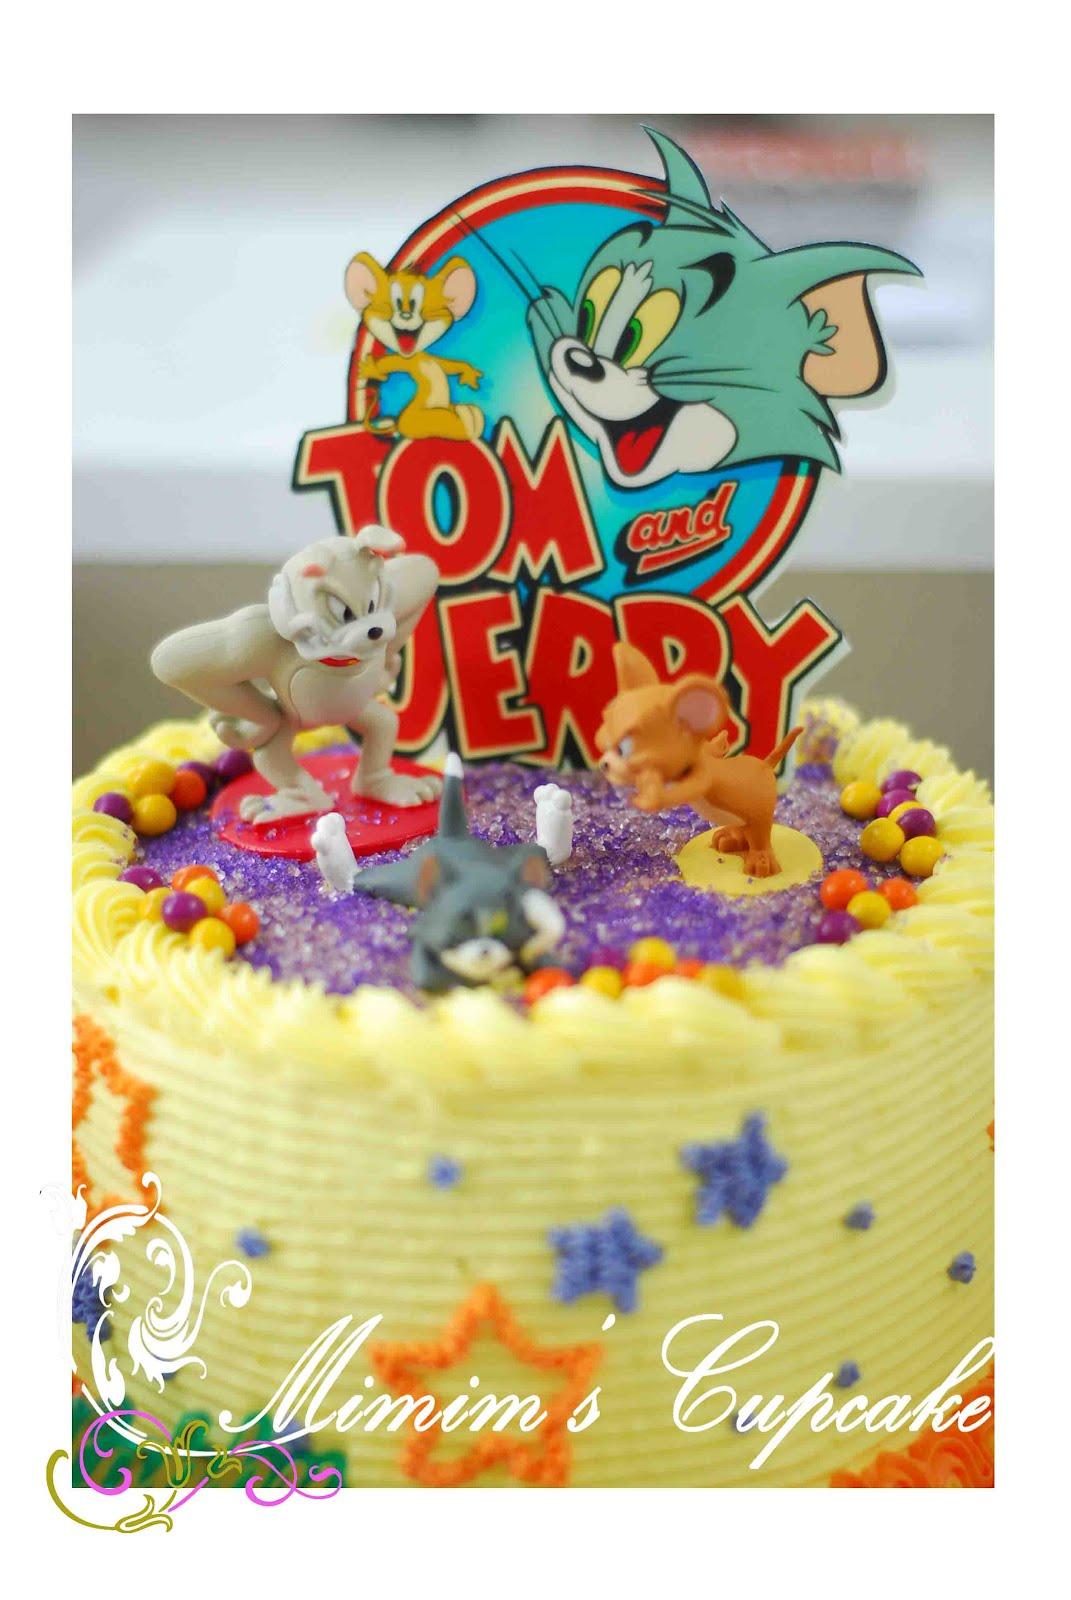 Pin Gambar Angry Birds Artwork 2 Pelautscom Cake On Pinterest